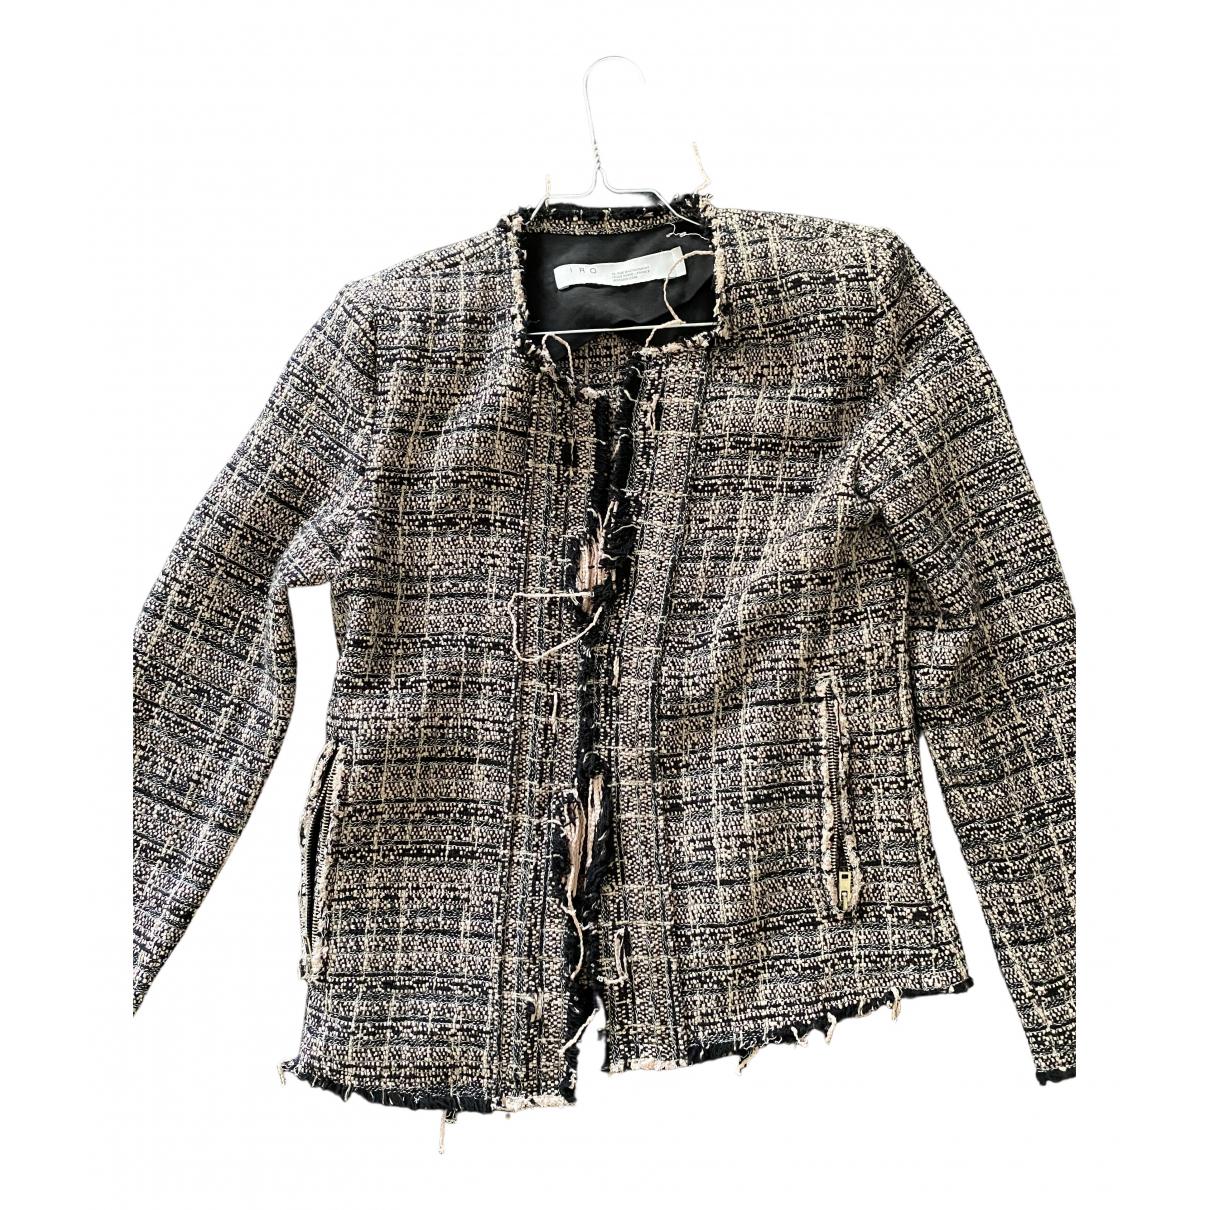 Iro - Veste Fall Winter 2019 pour femme en tweed - rose